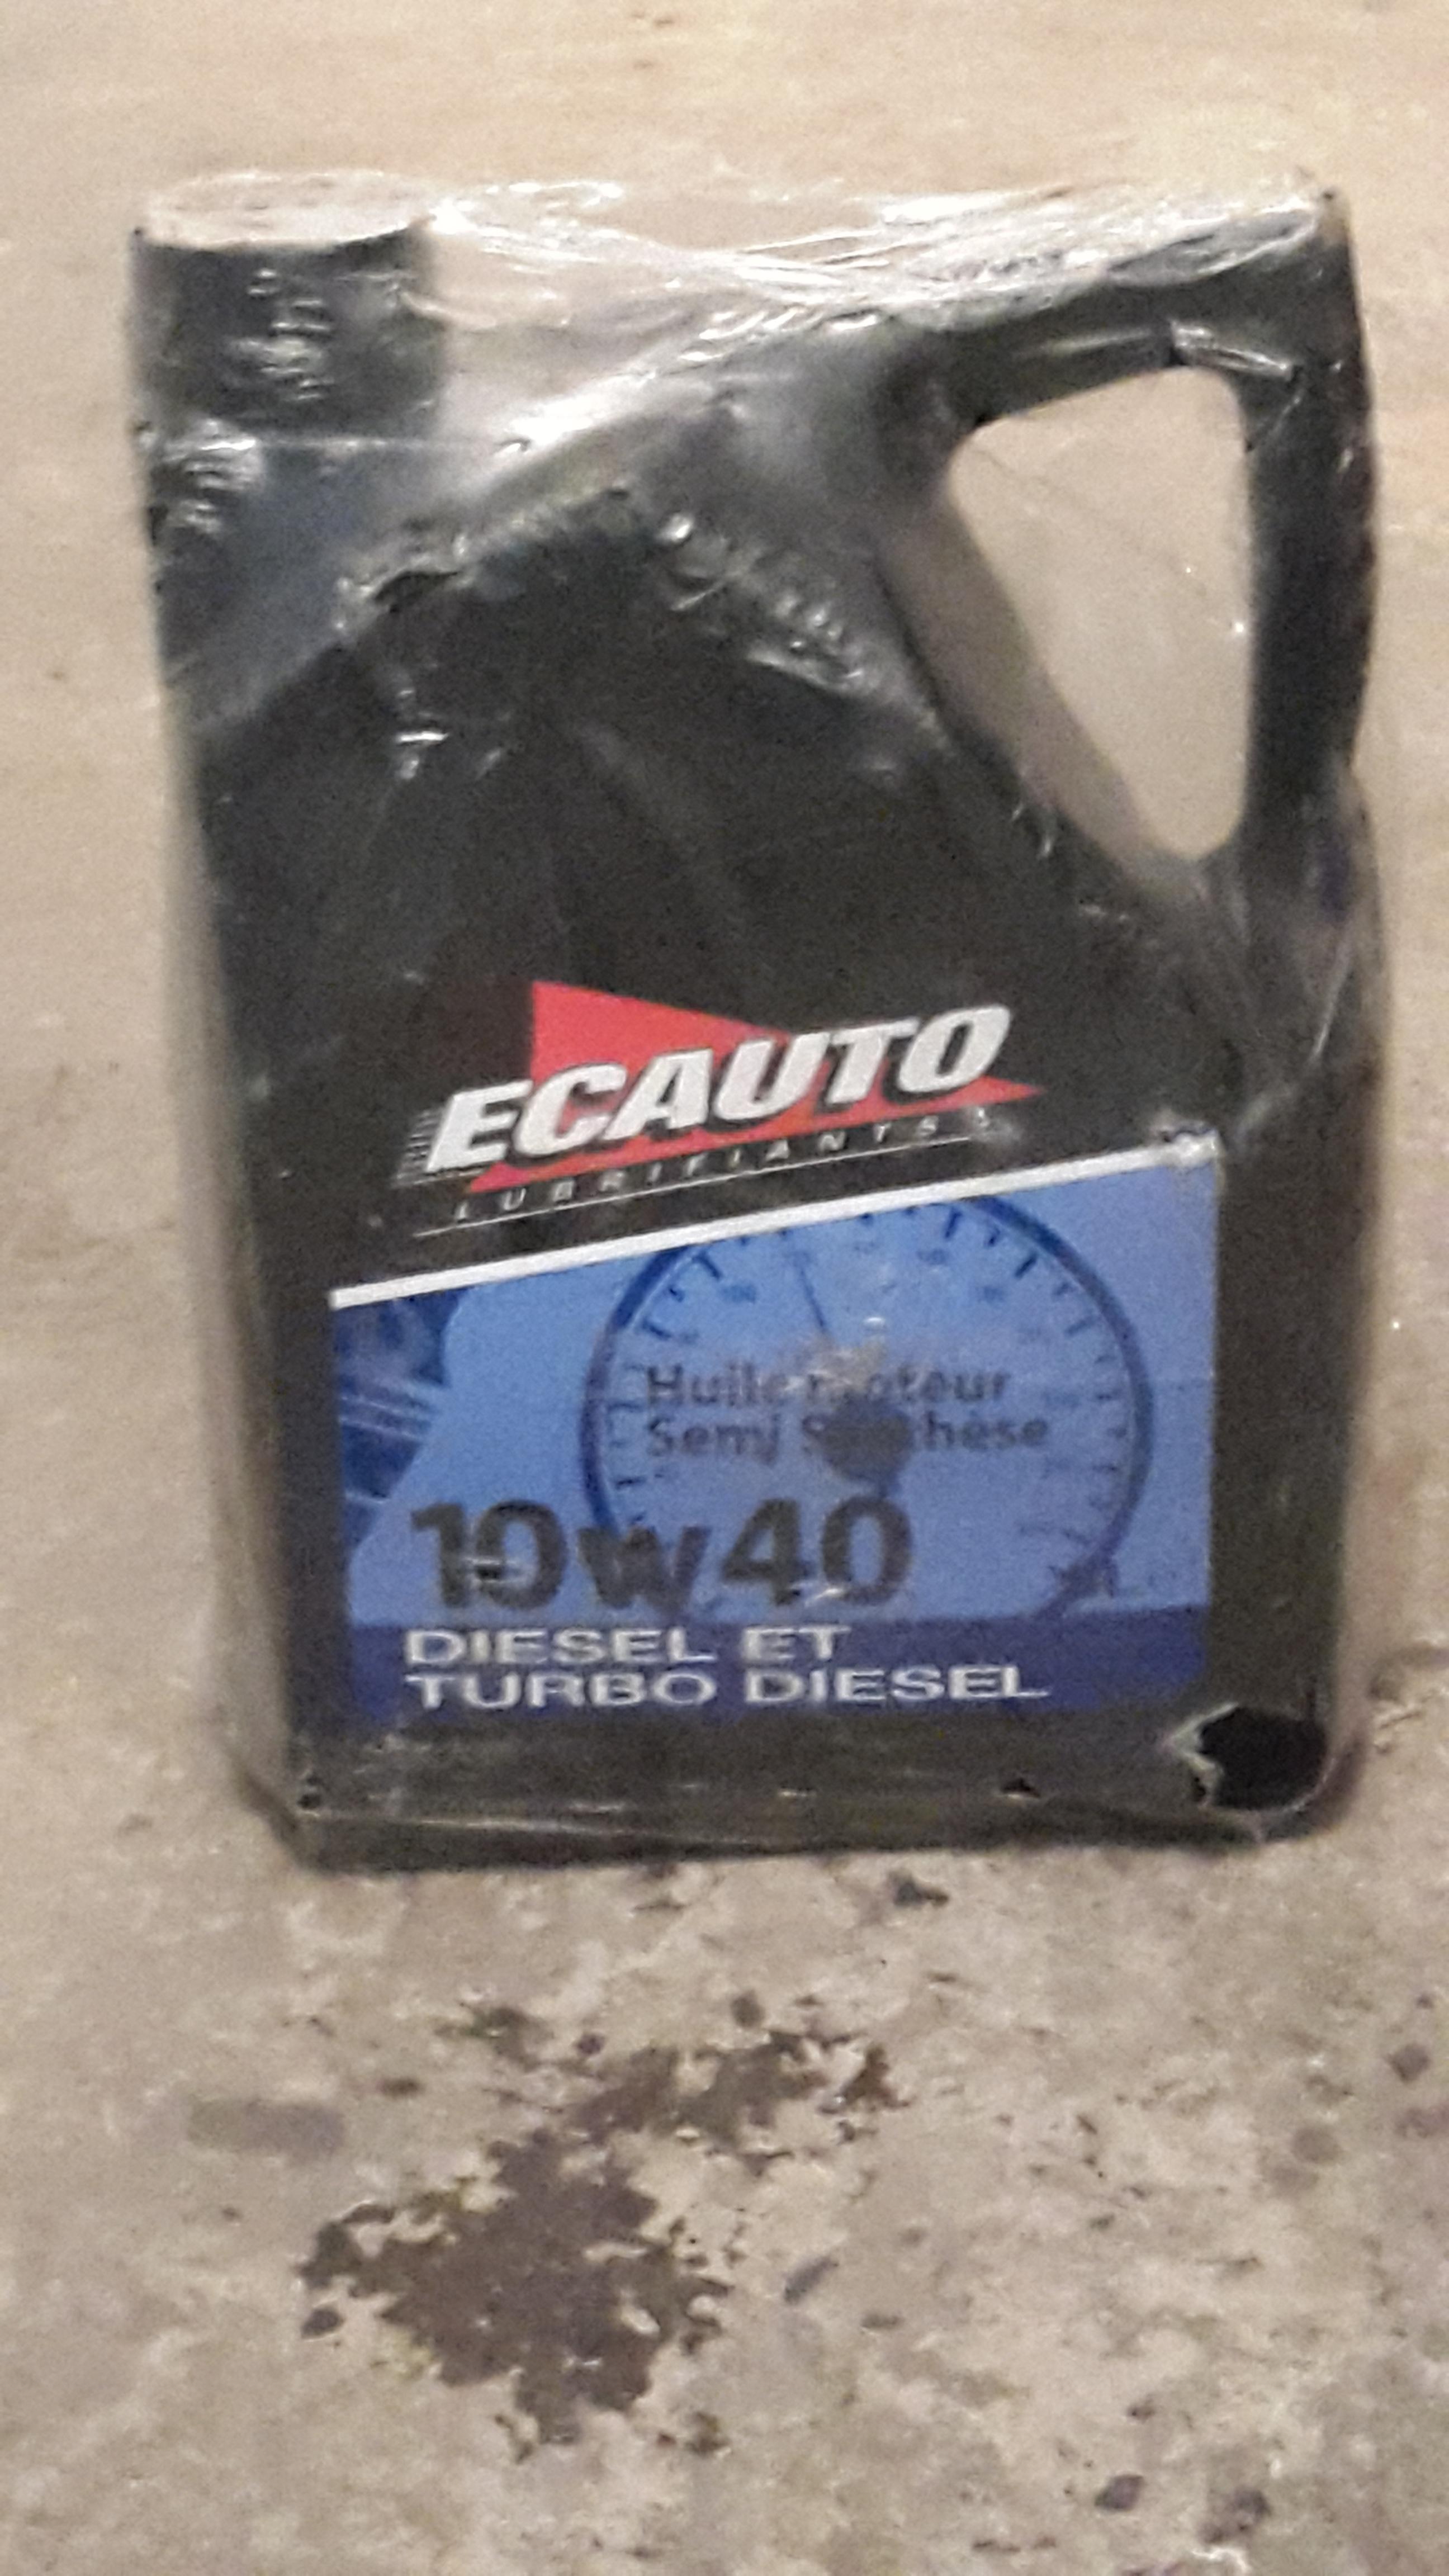 troc de troc huile moteur diesel ou turbo diesel image 0